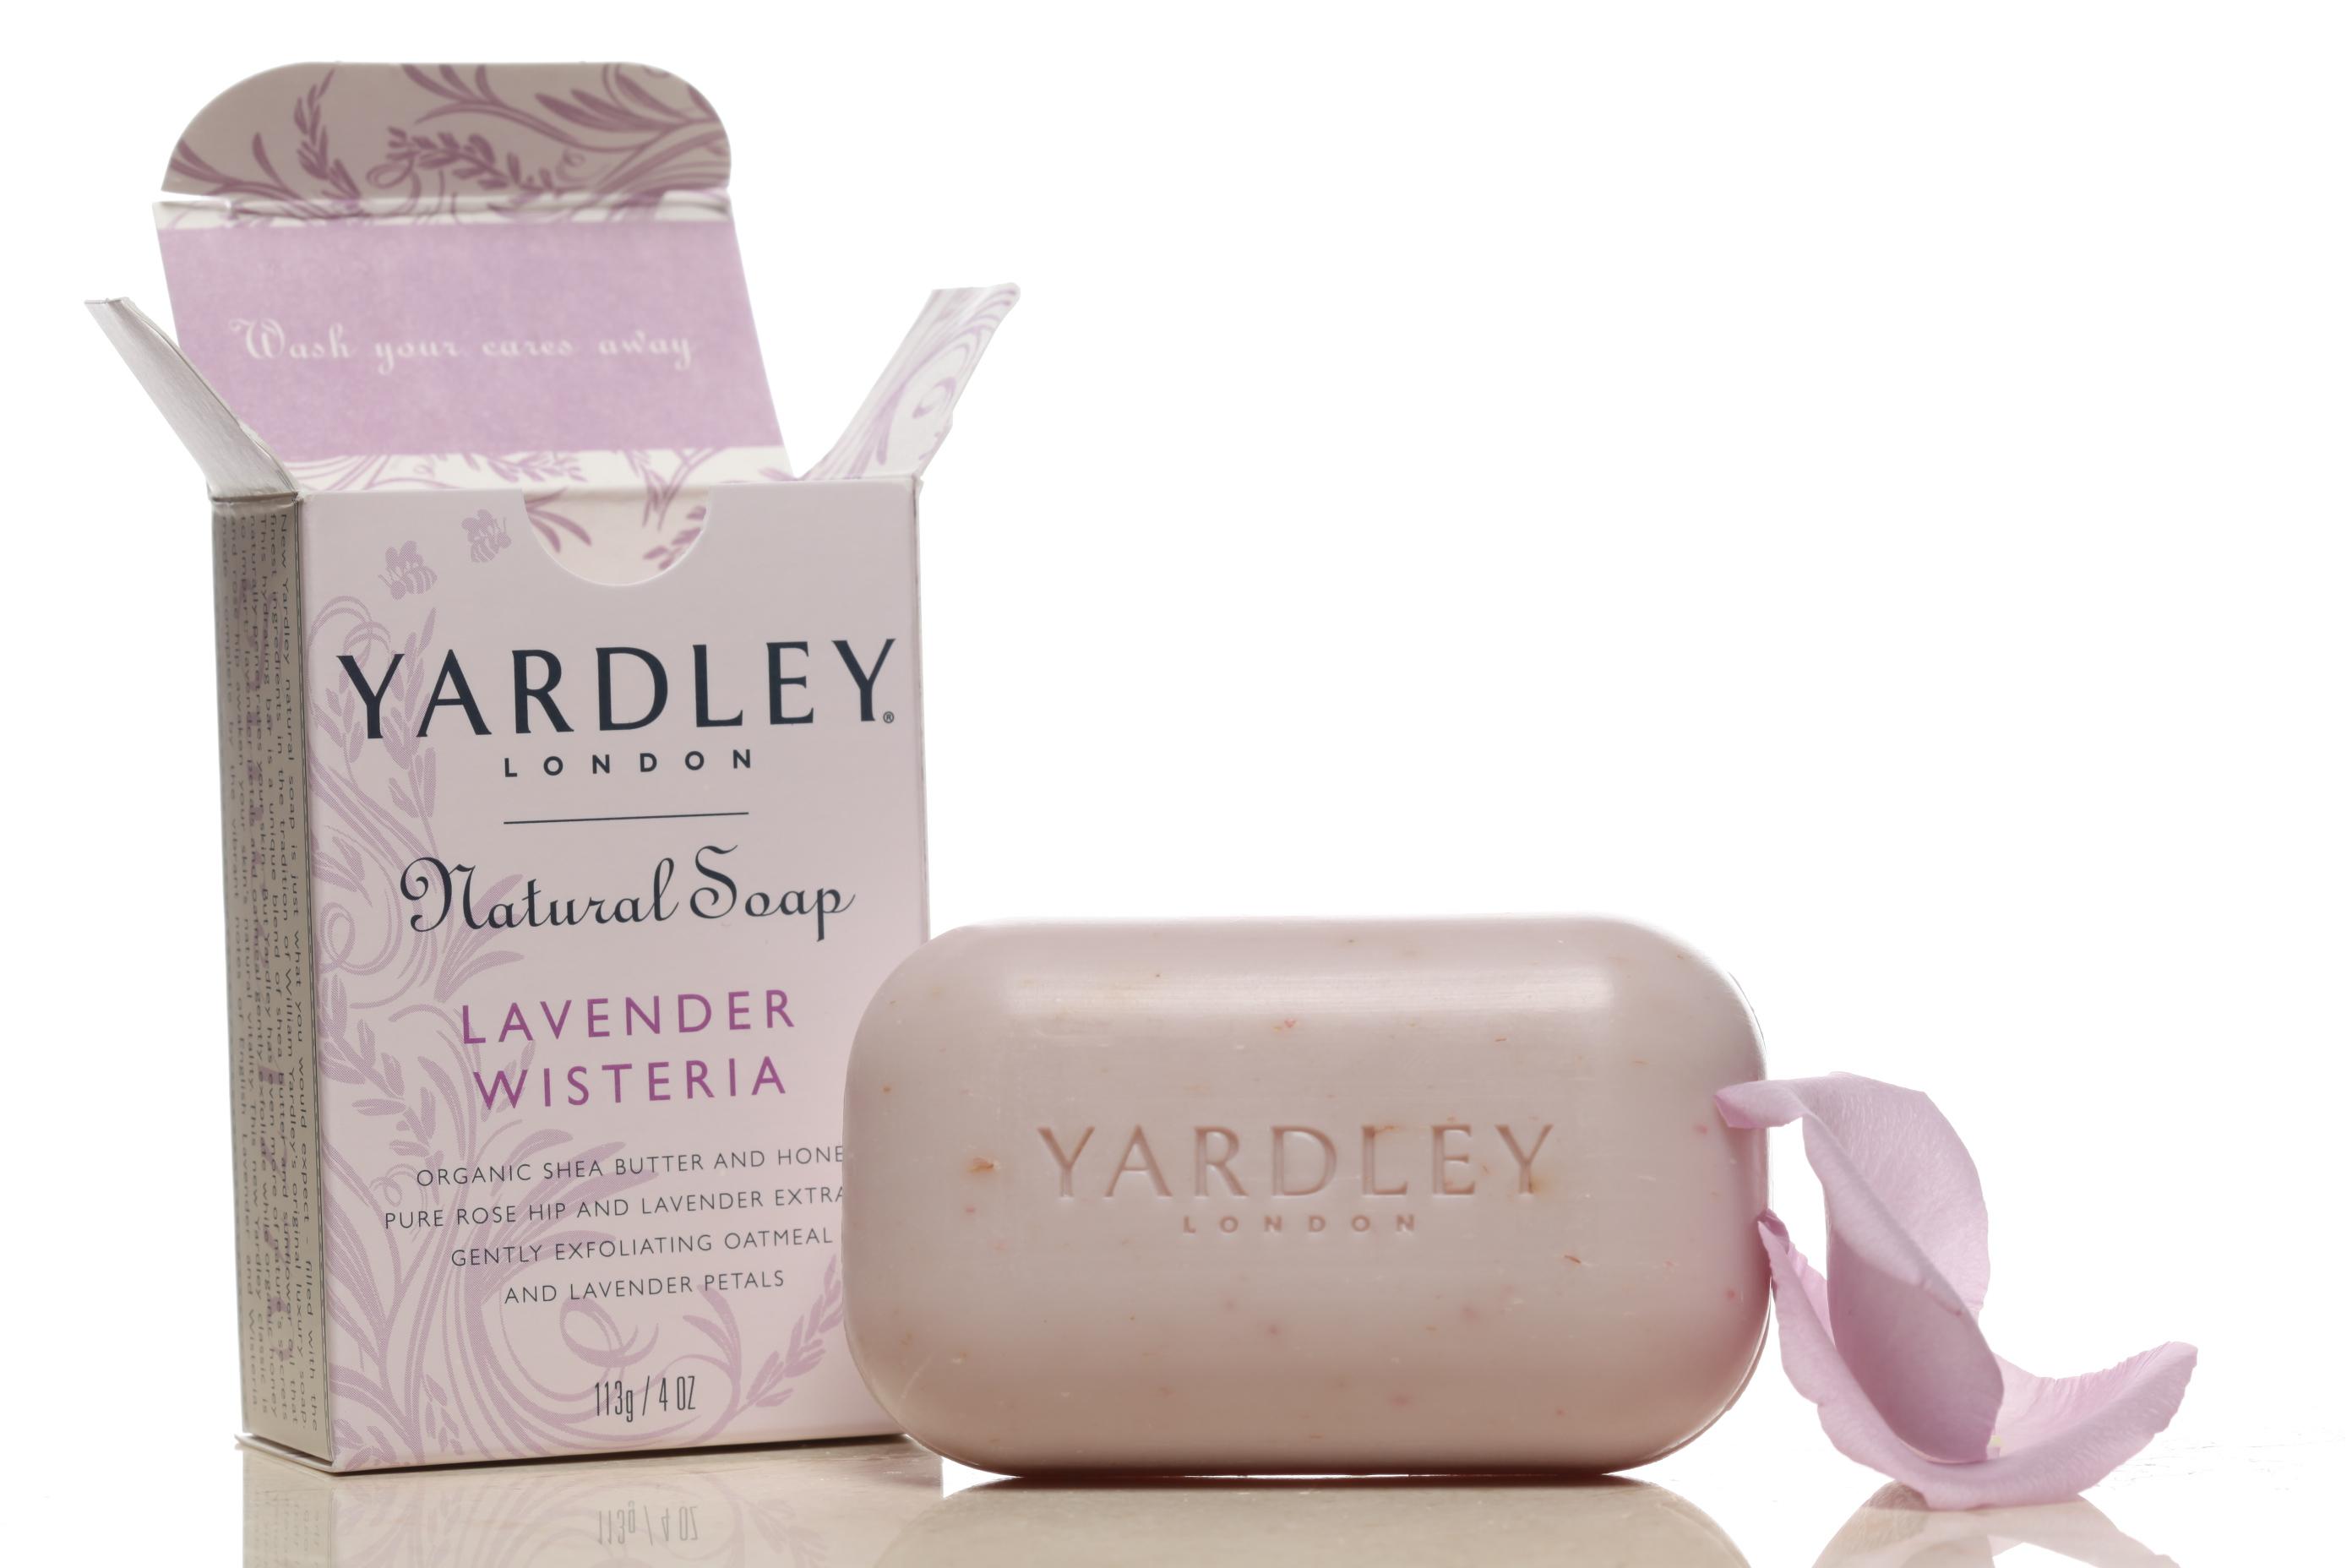 Yardley if London Botanical and Natural Soaps